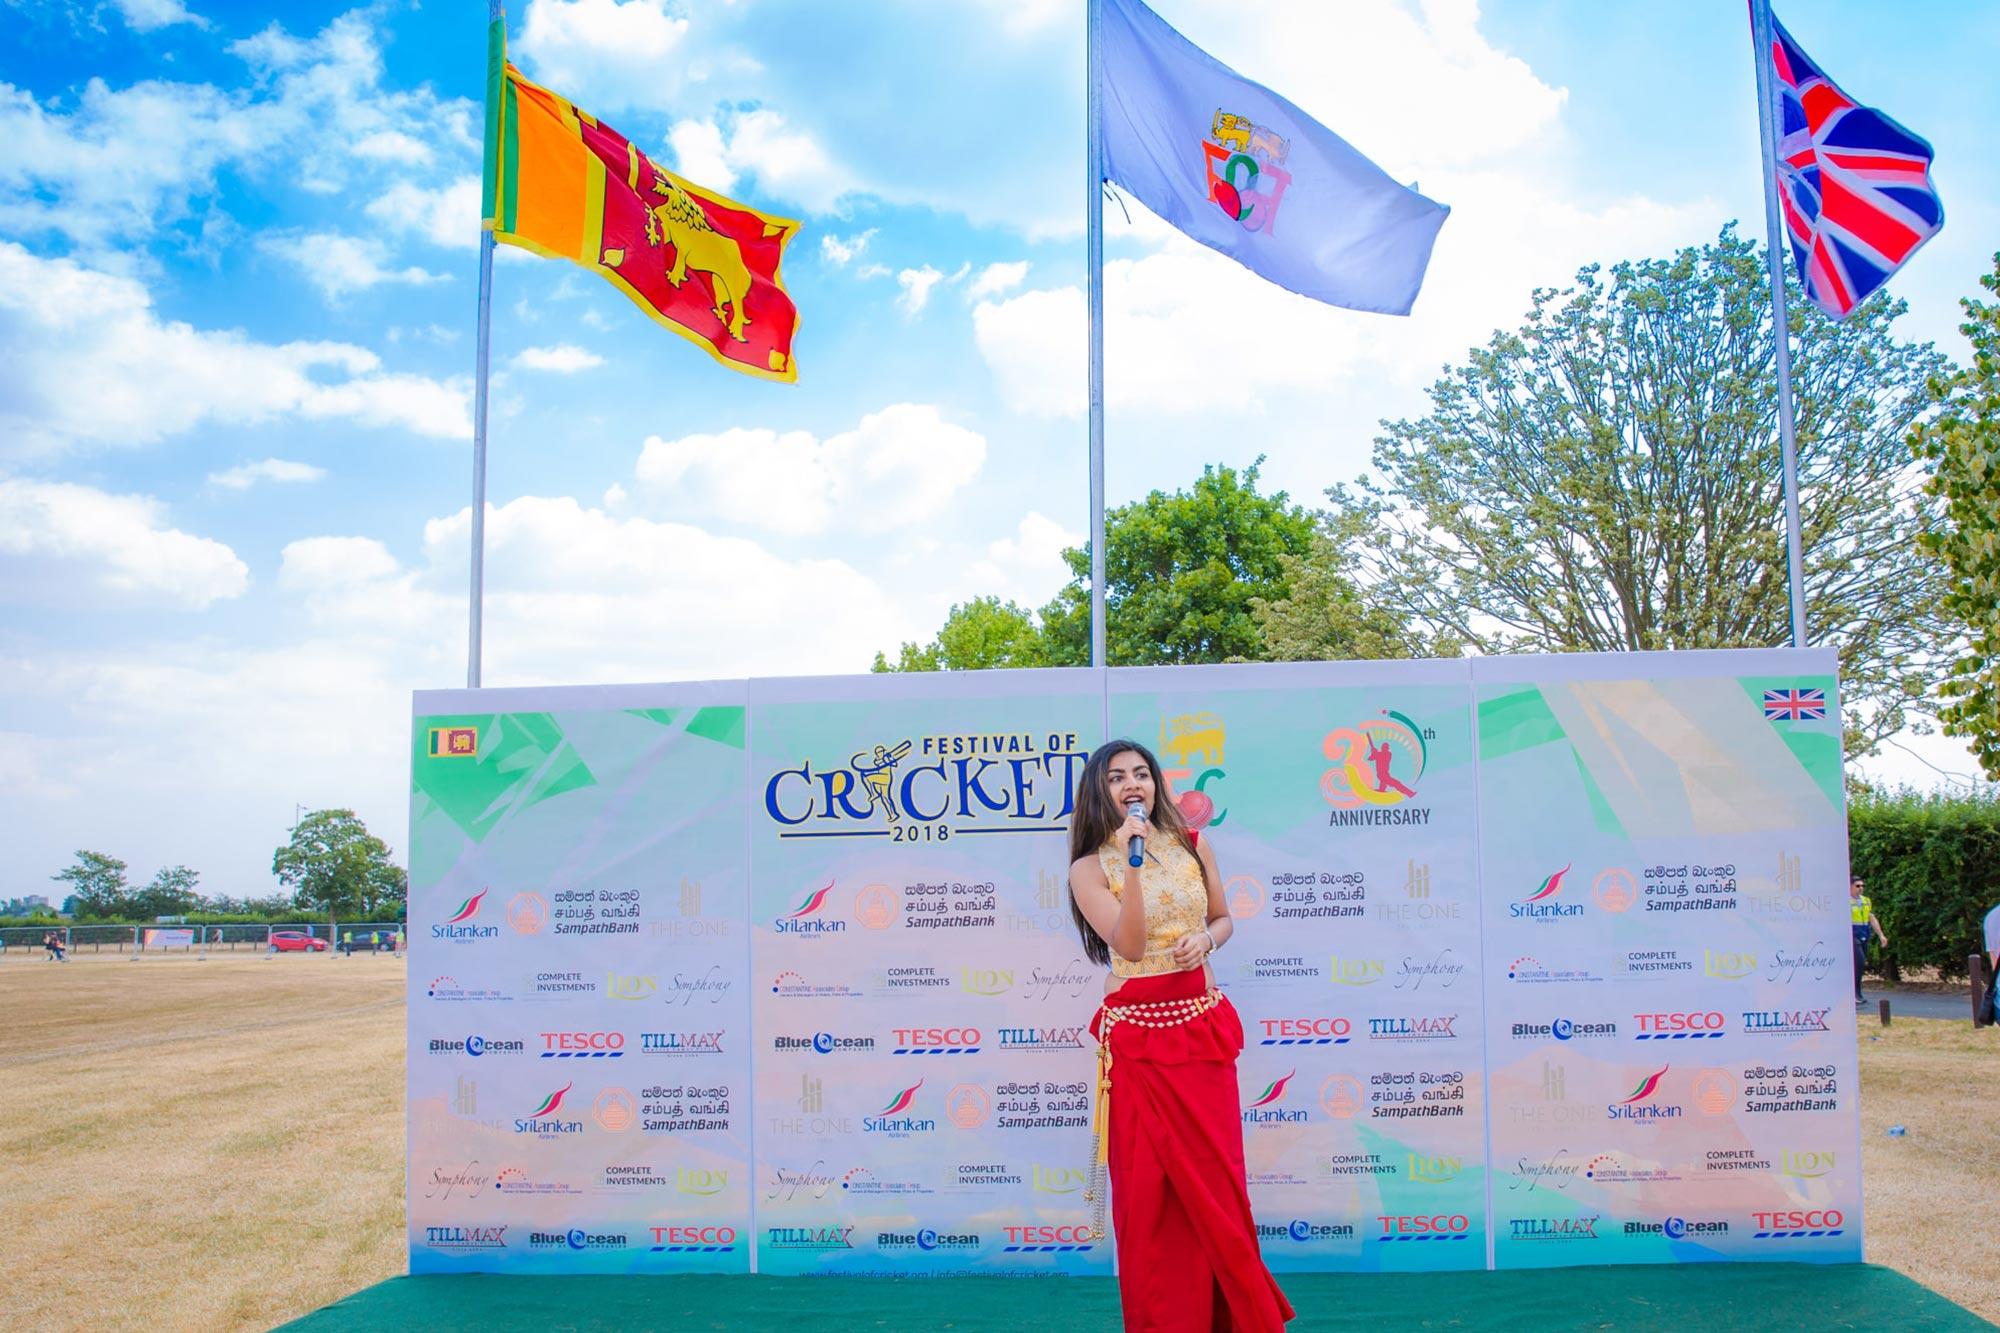 Festival of Cricket 2018